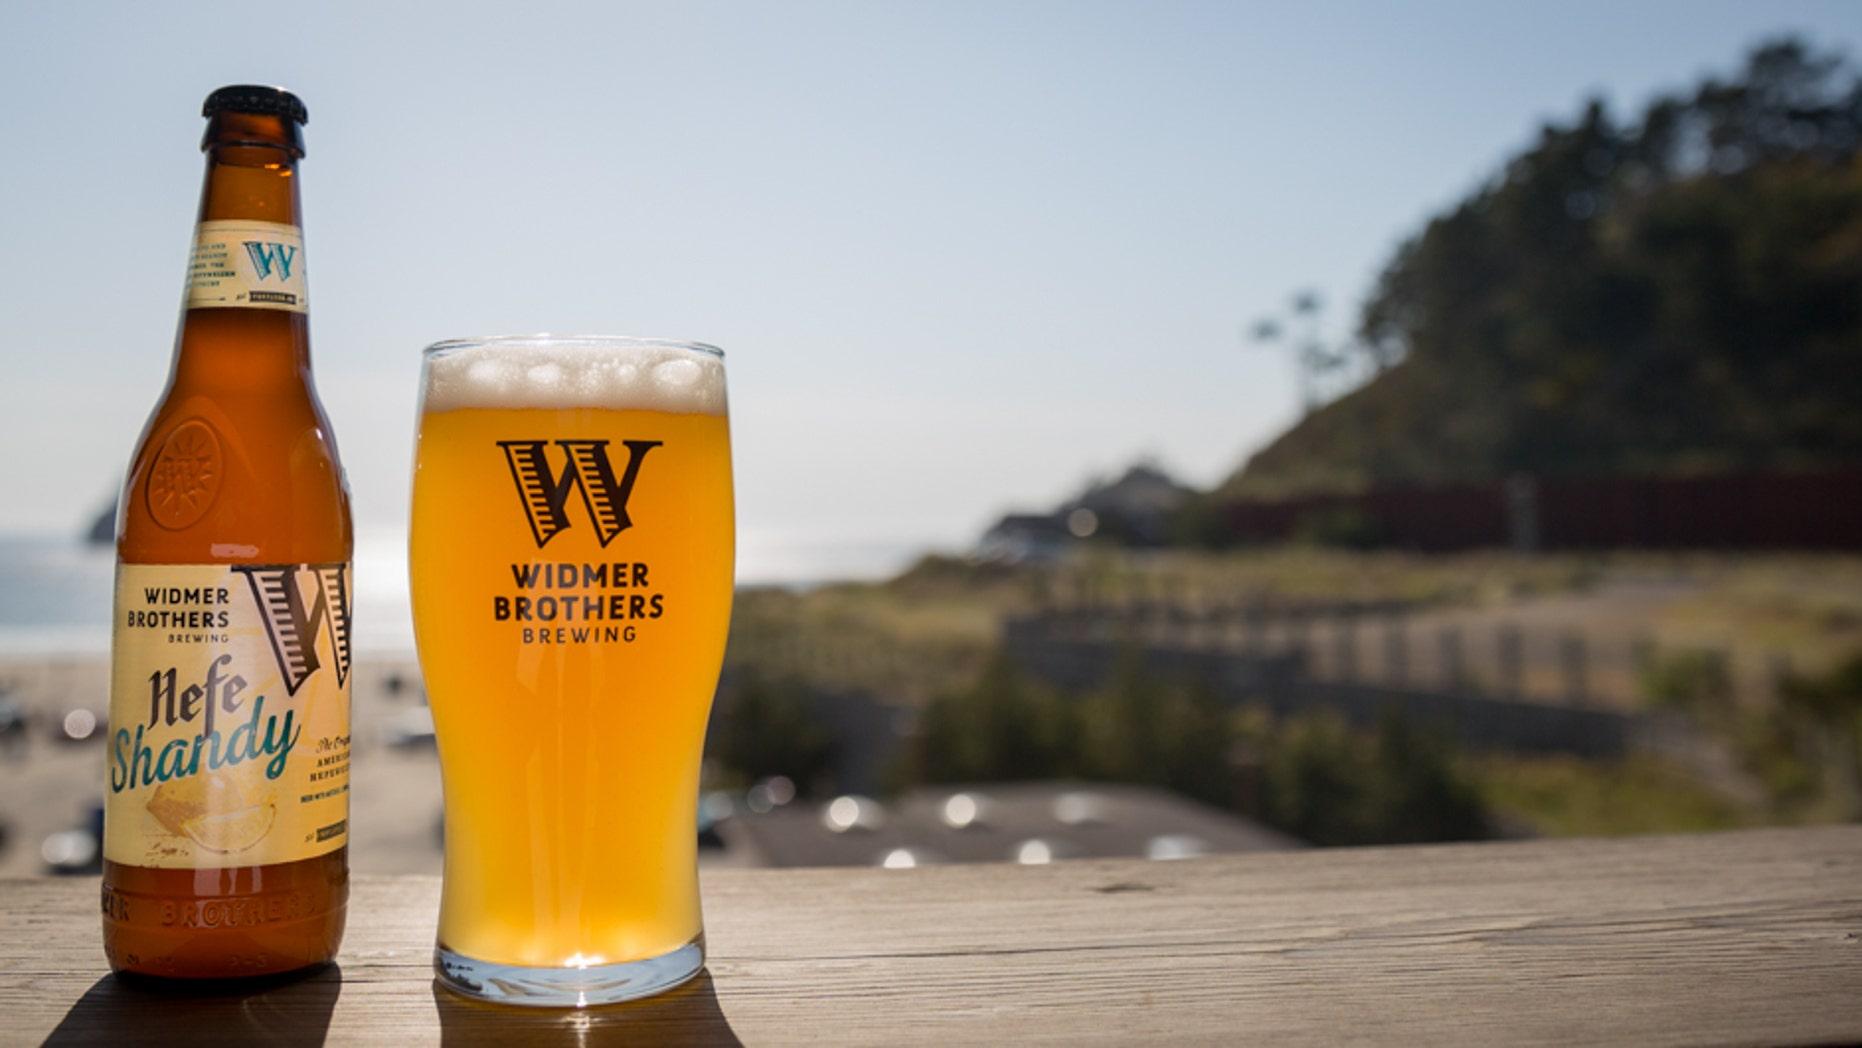 A refreshing summer beer that's still full of flavor.